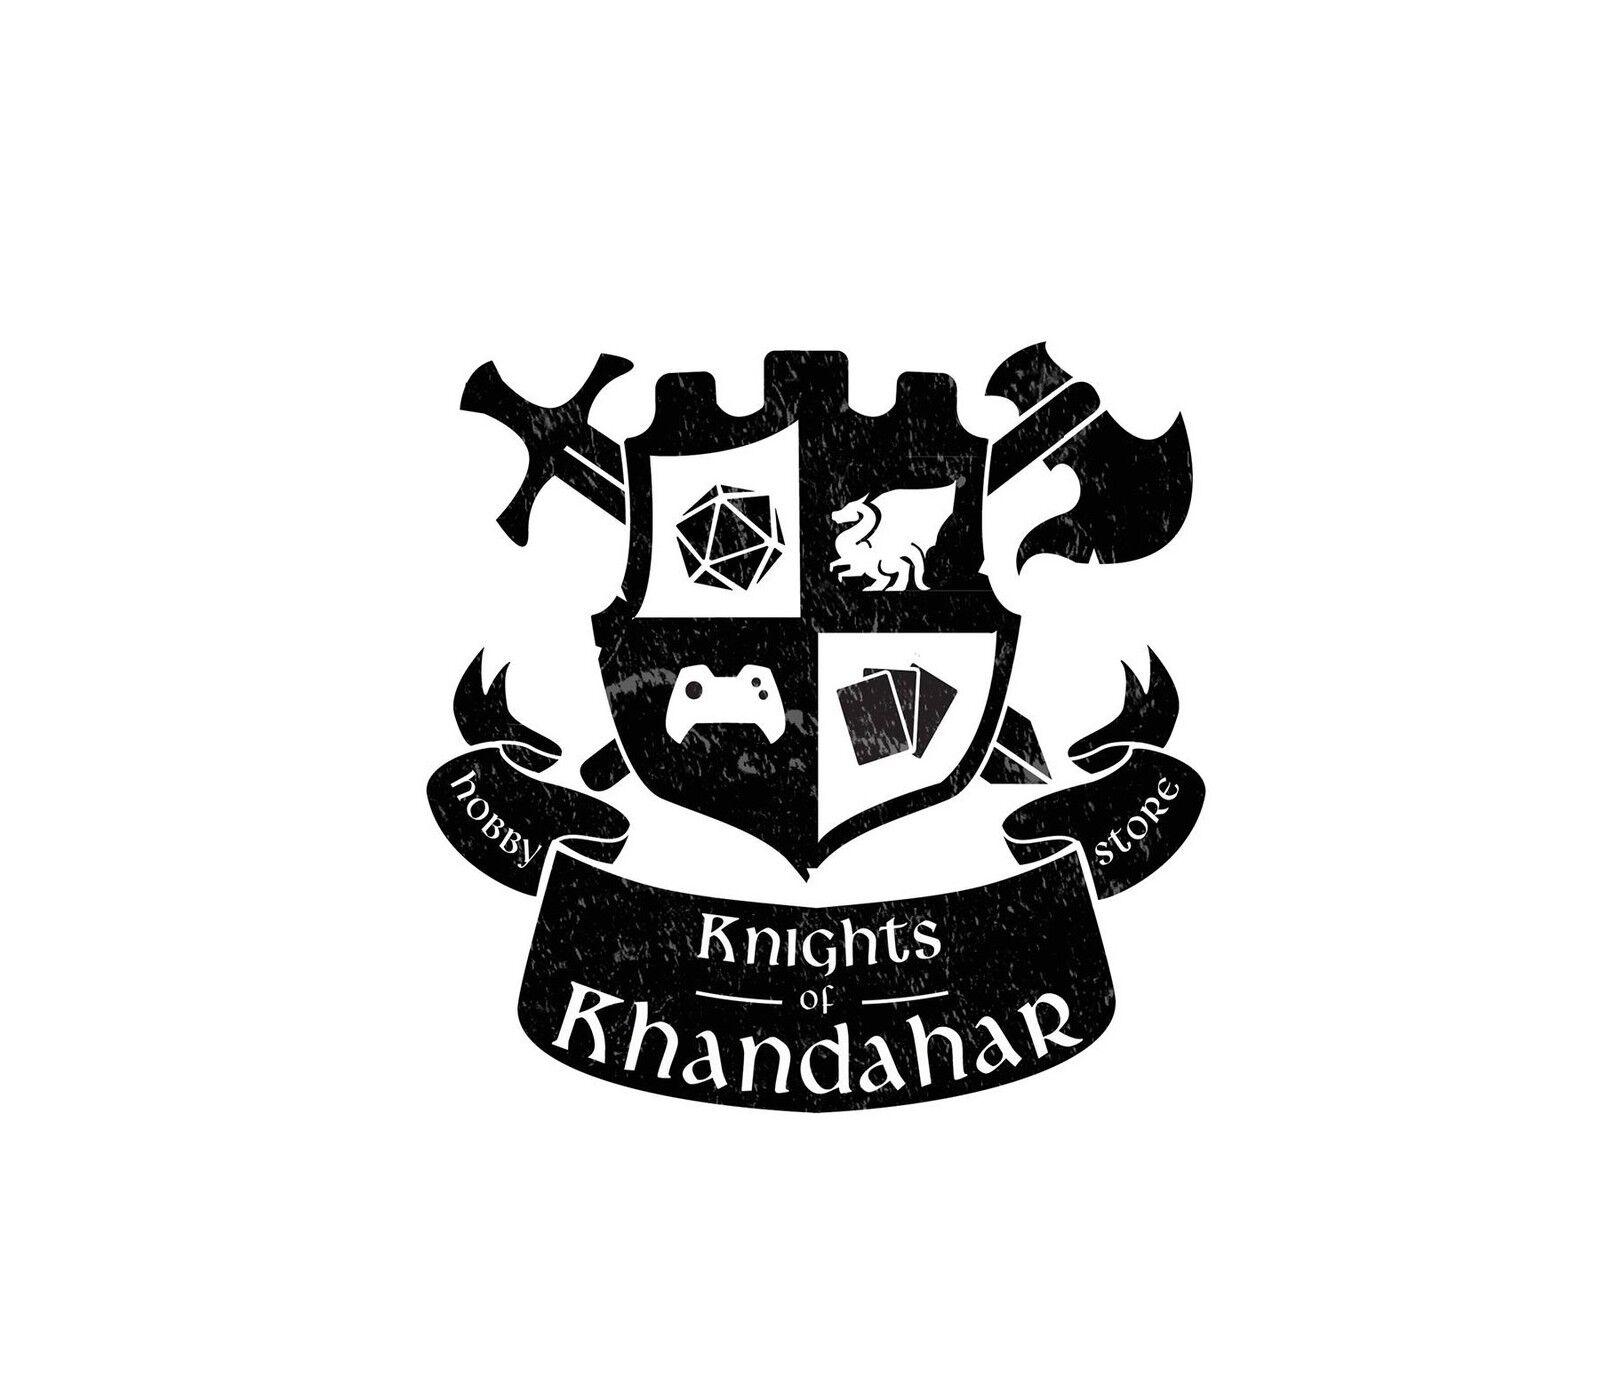 Knights of Khandahar Hobby store